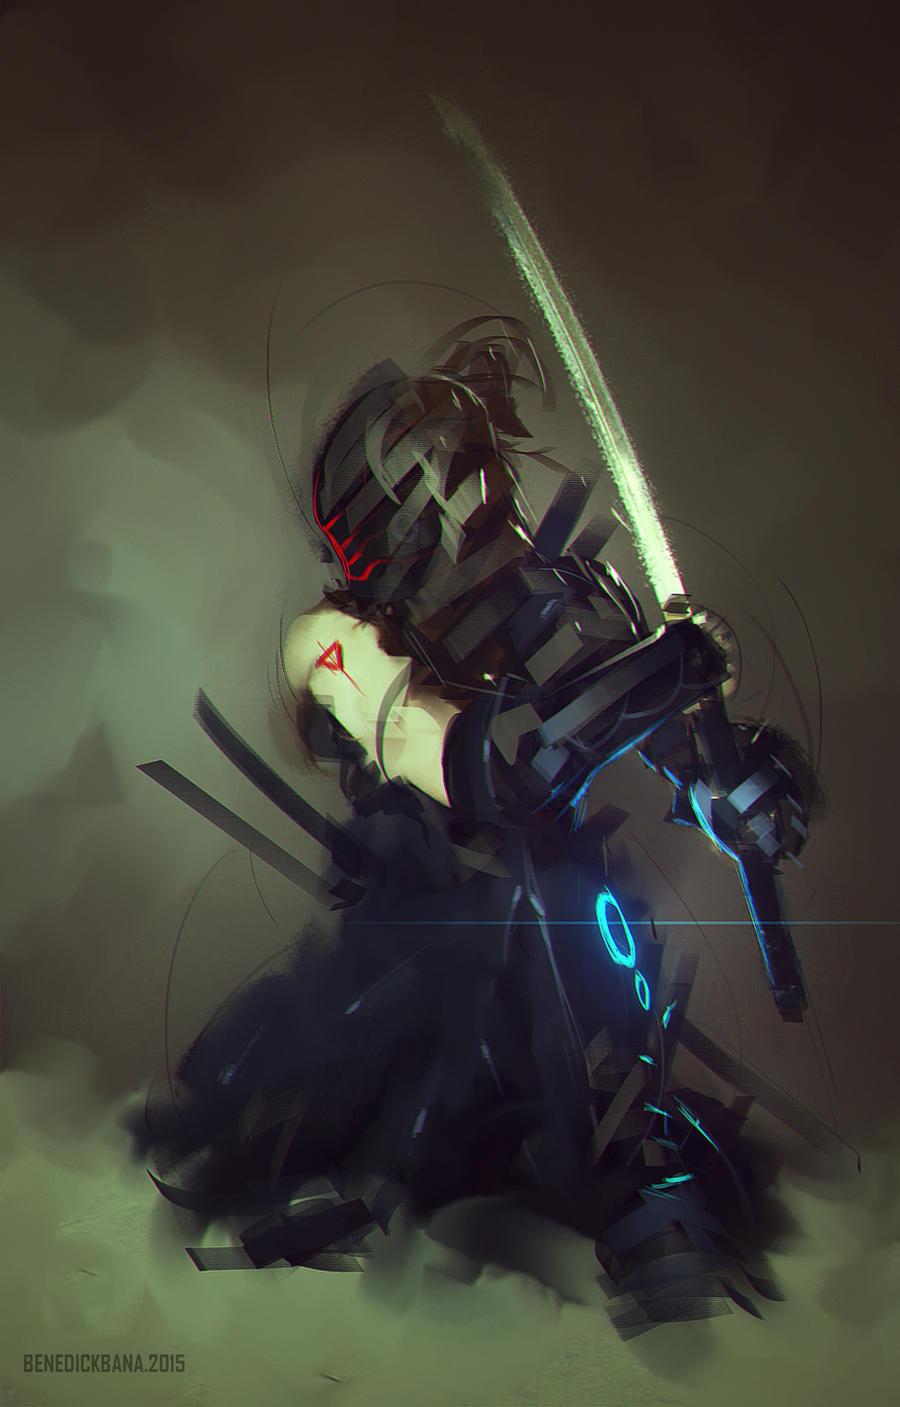 Robot Ninja by benedickbana